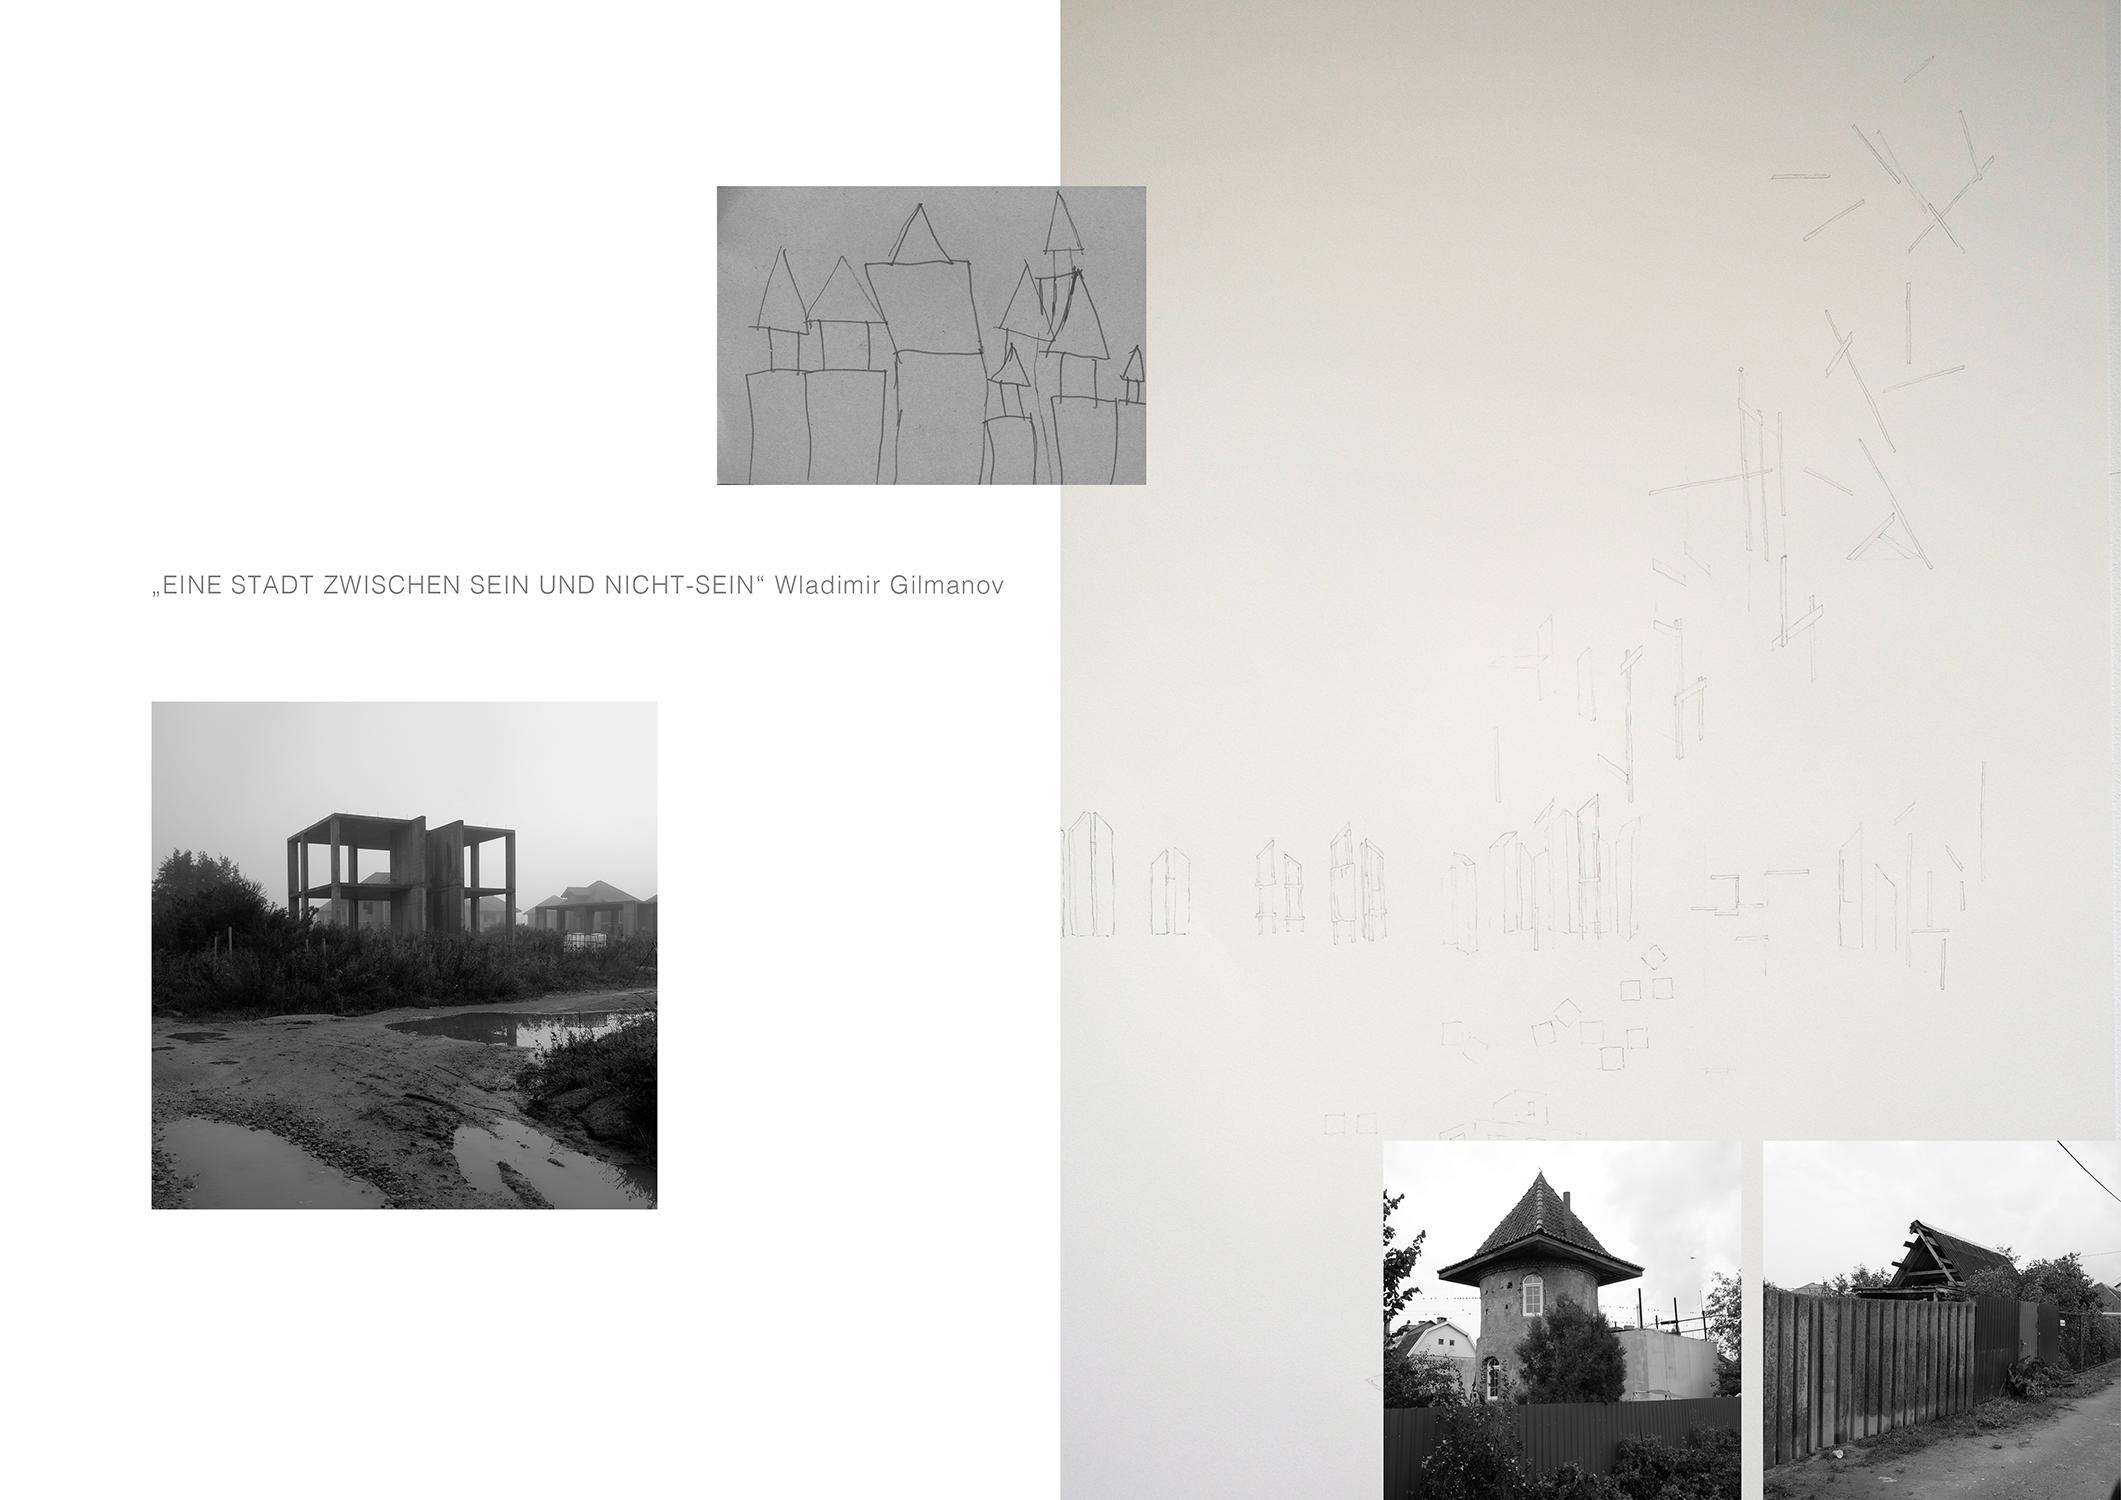 © Claire Laude, Ephemeral Intersects, Publication #2